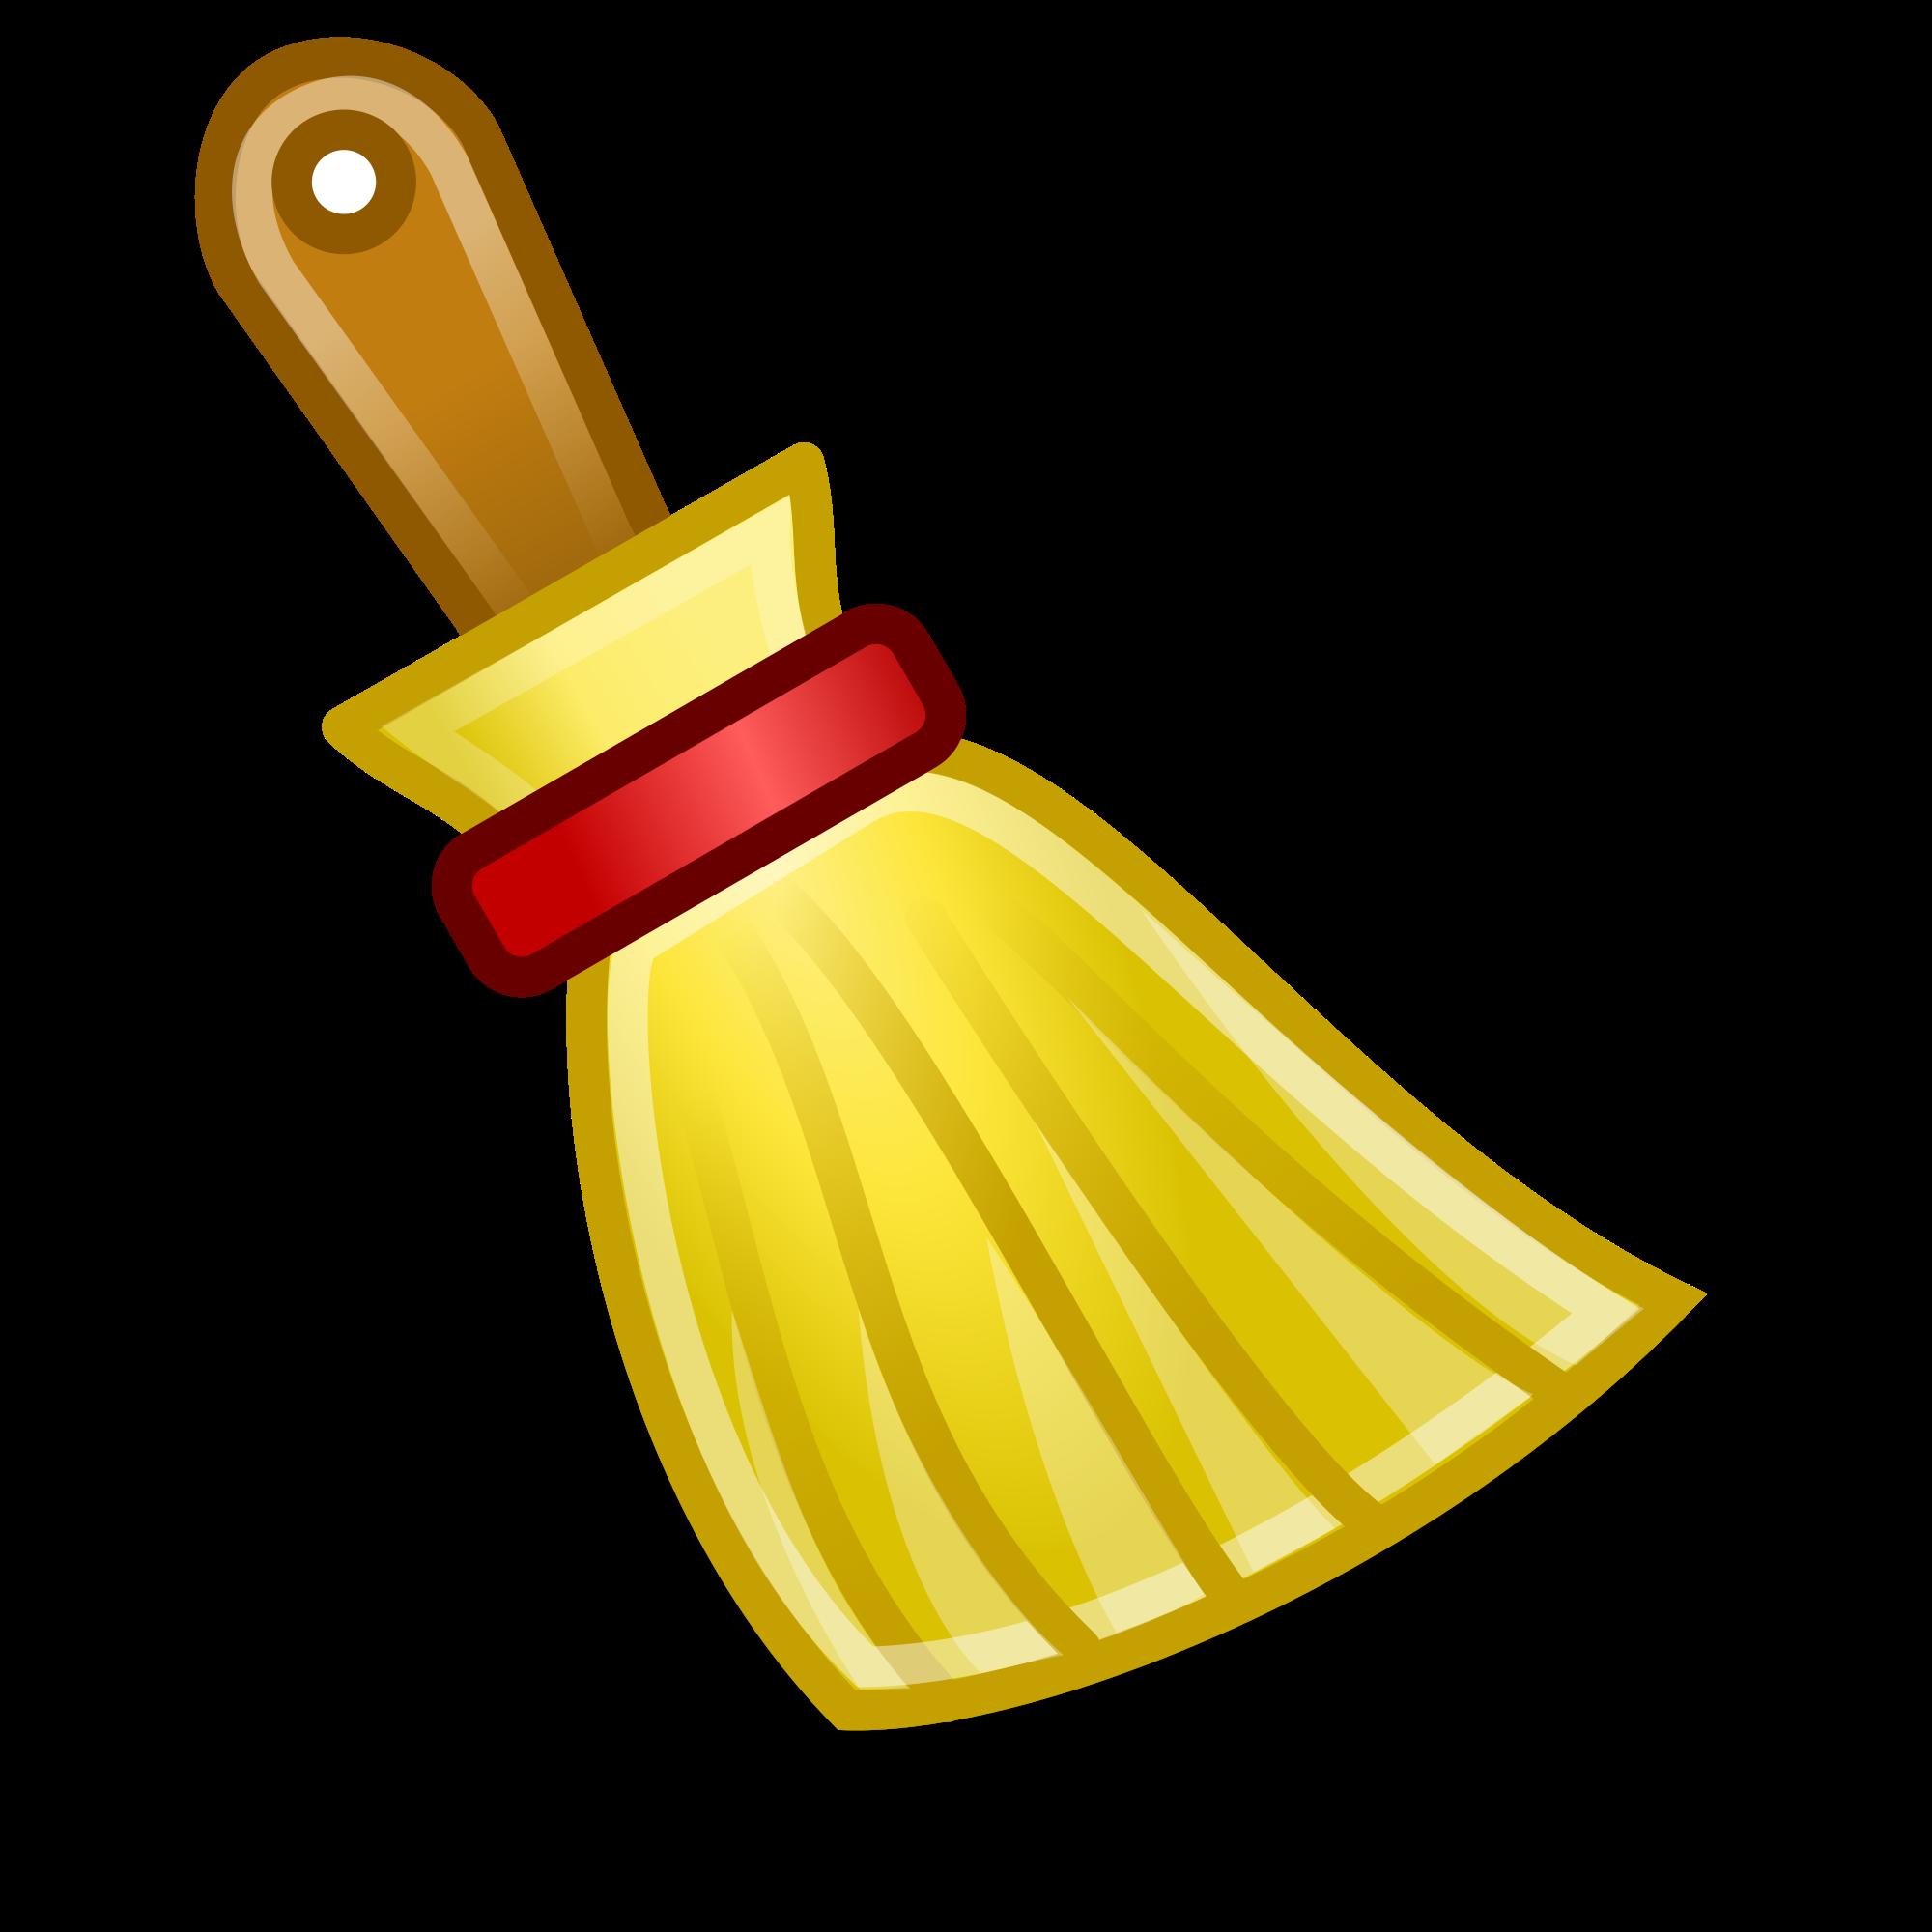 Nettoyer, faire le tri